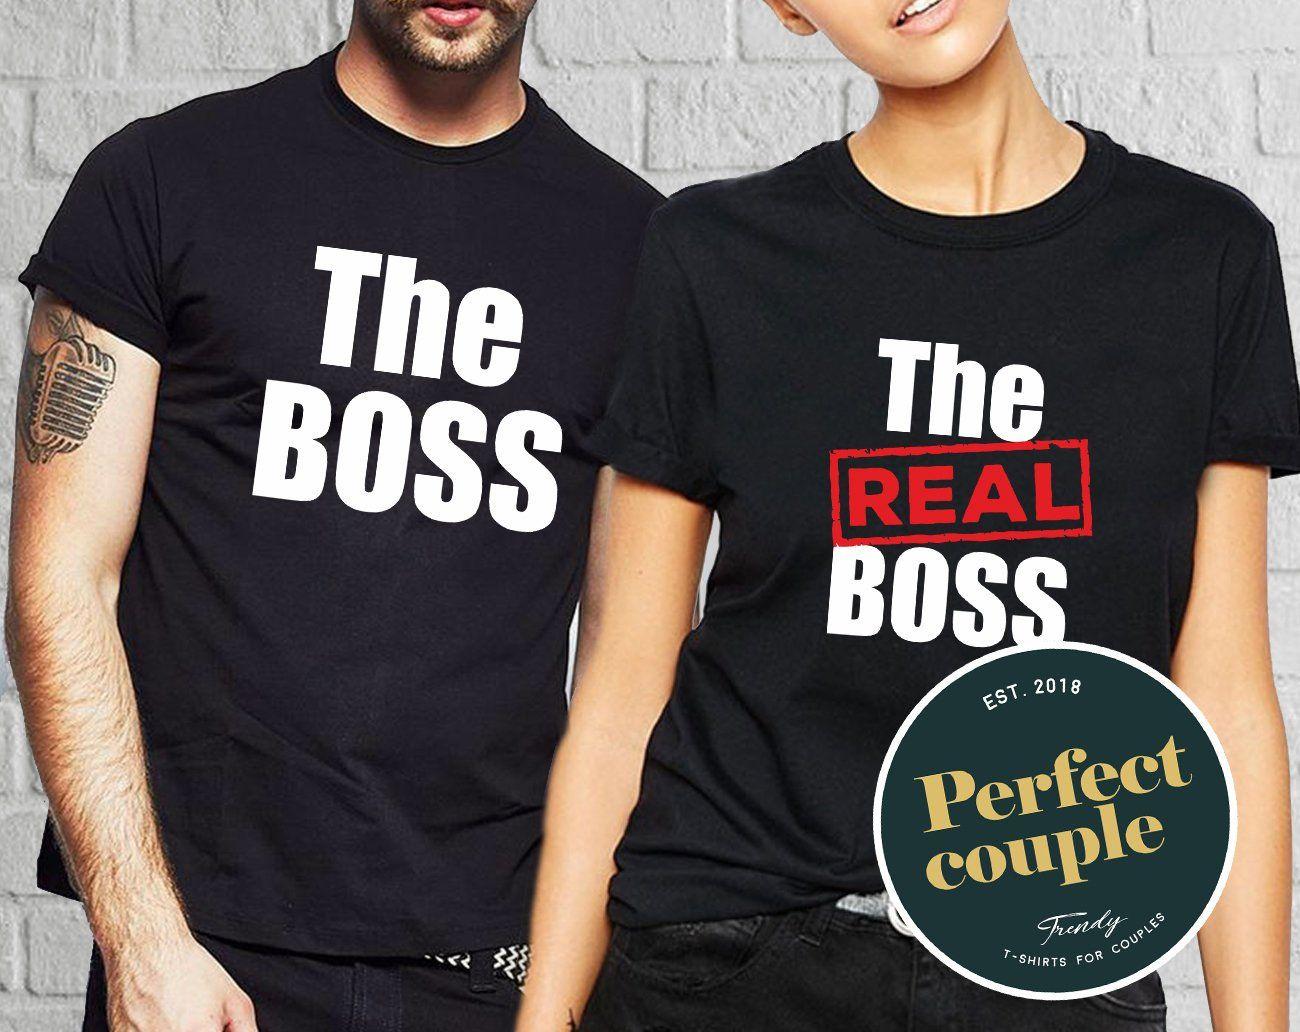 720496b032 Couple Tshirts, High Quality T Shirts, Funny Shirts, Relationships,  Relationship